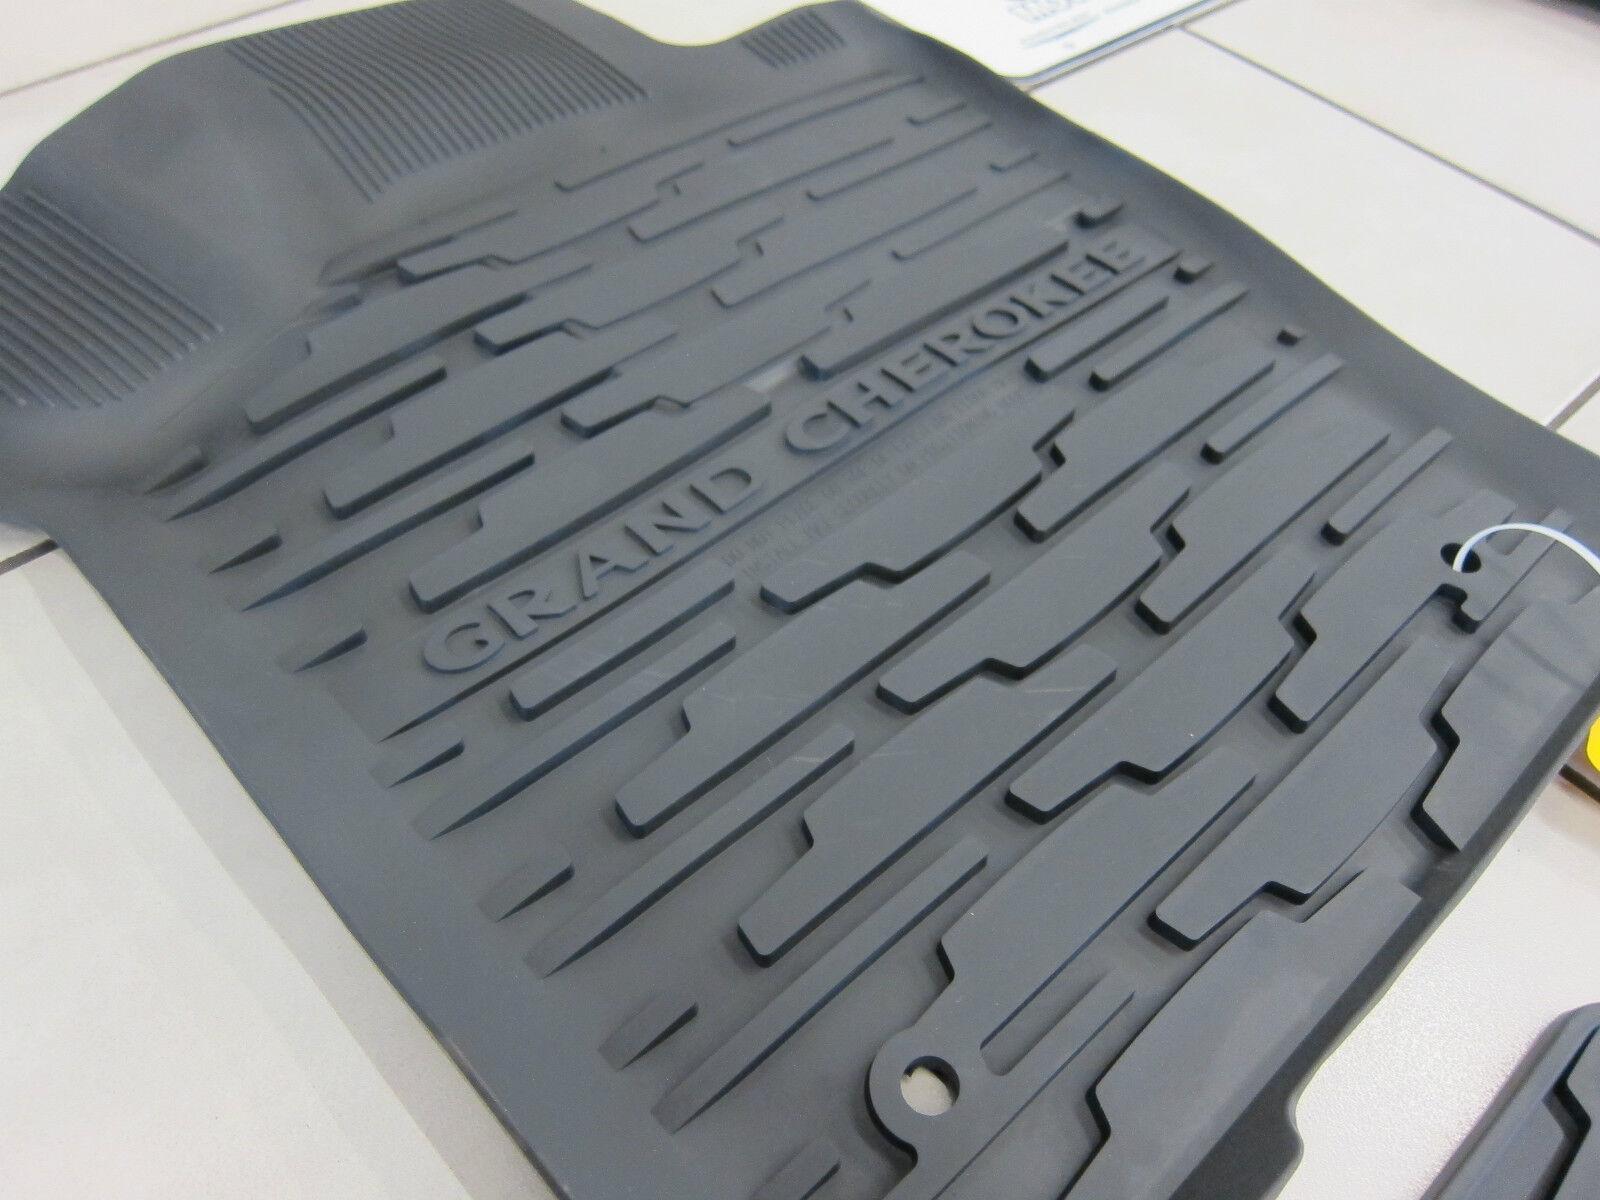 2013 2015 jeep grand cherokee rubber slush floor mats cargo tray liner set ebay. Black Bedroom Furniture Sets. Home Design Ideas